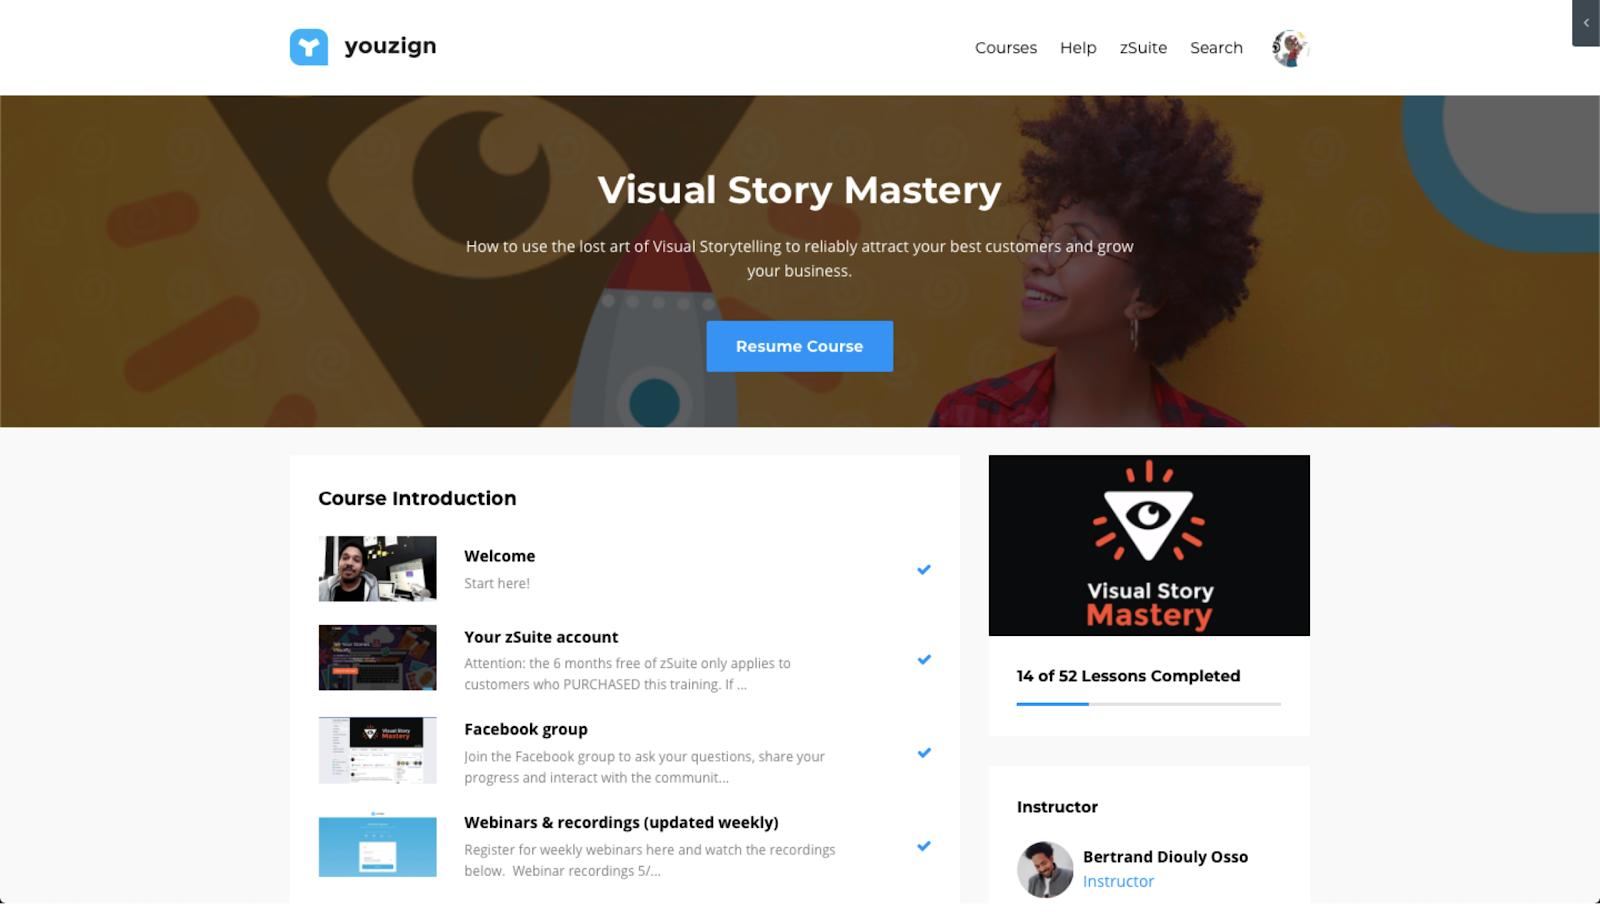 Visual Story Mastery homepage